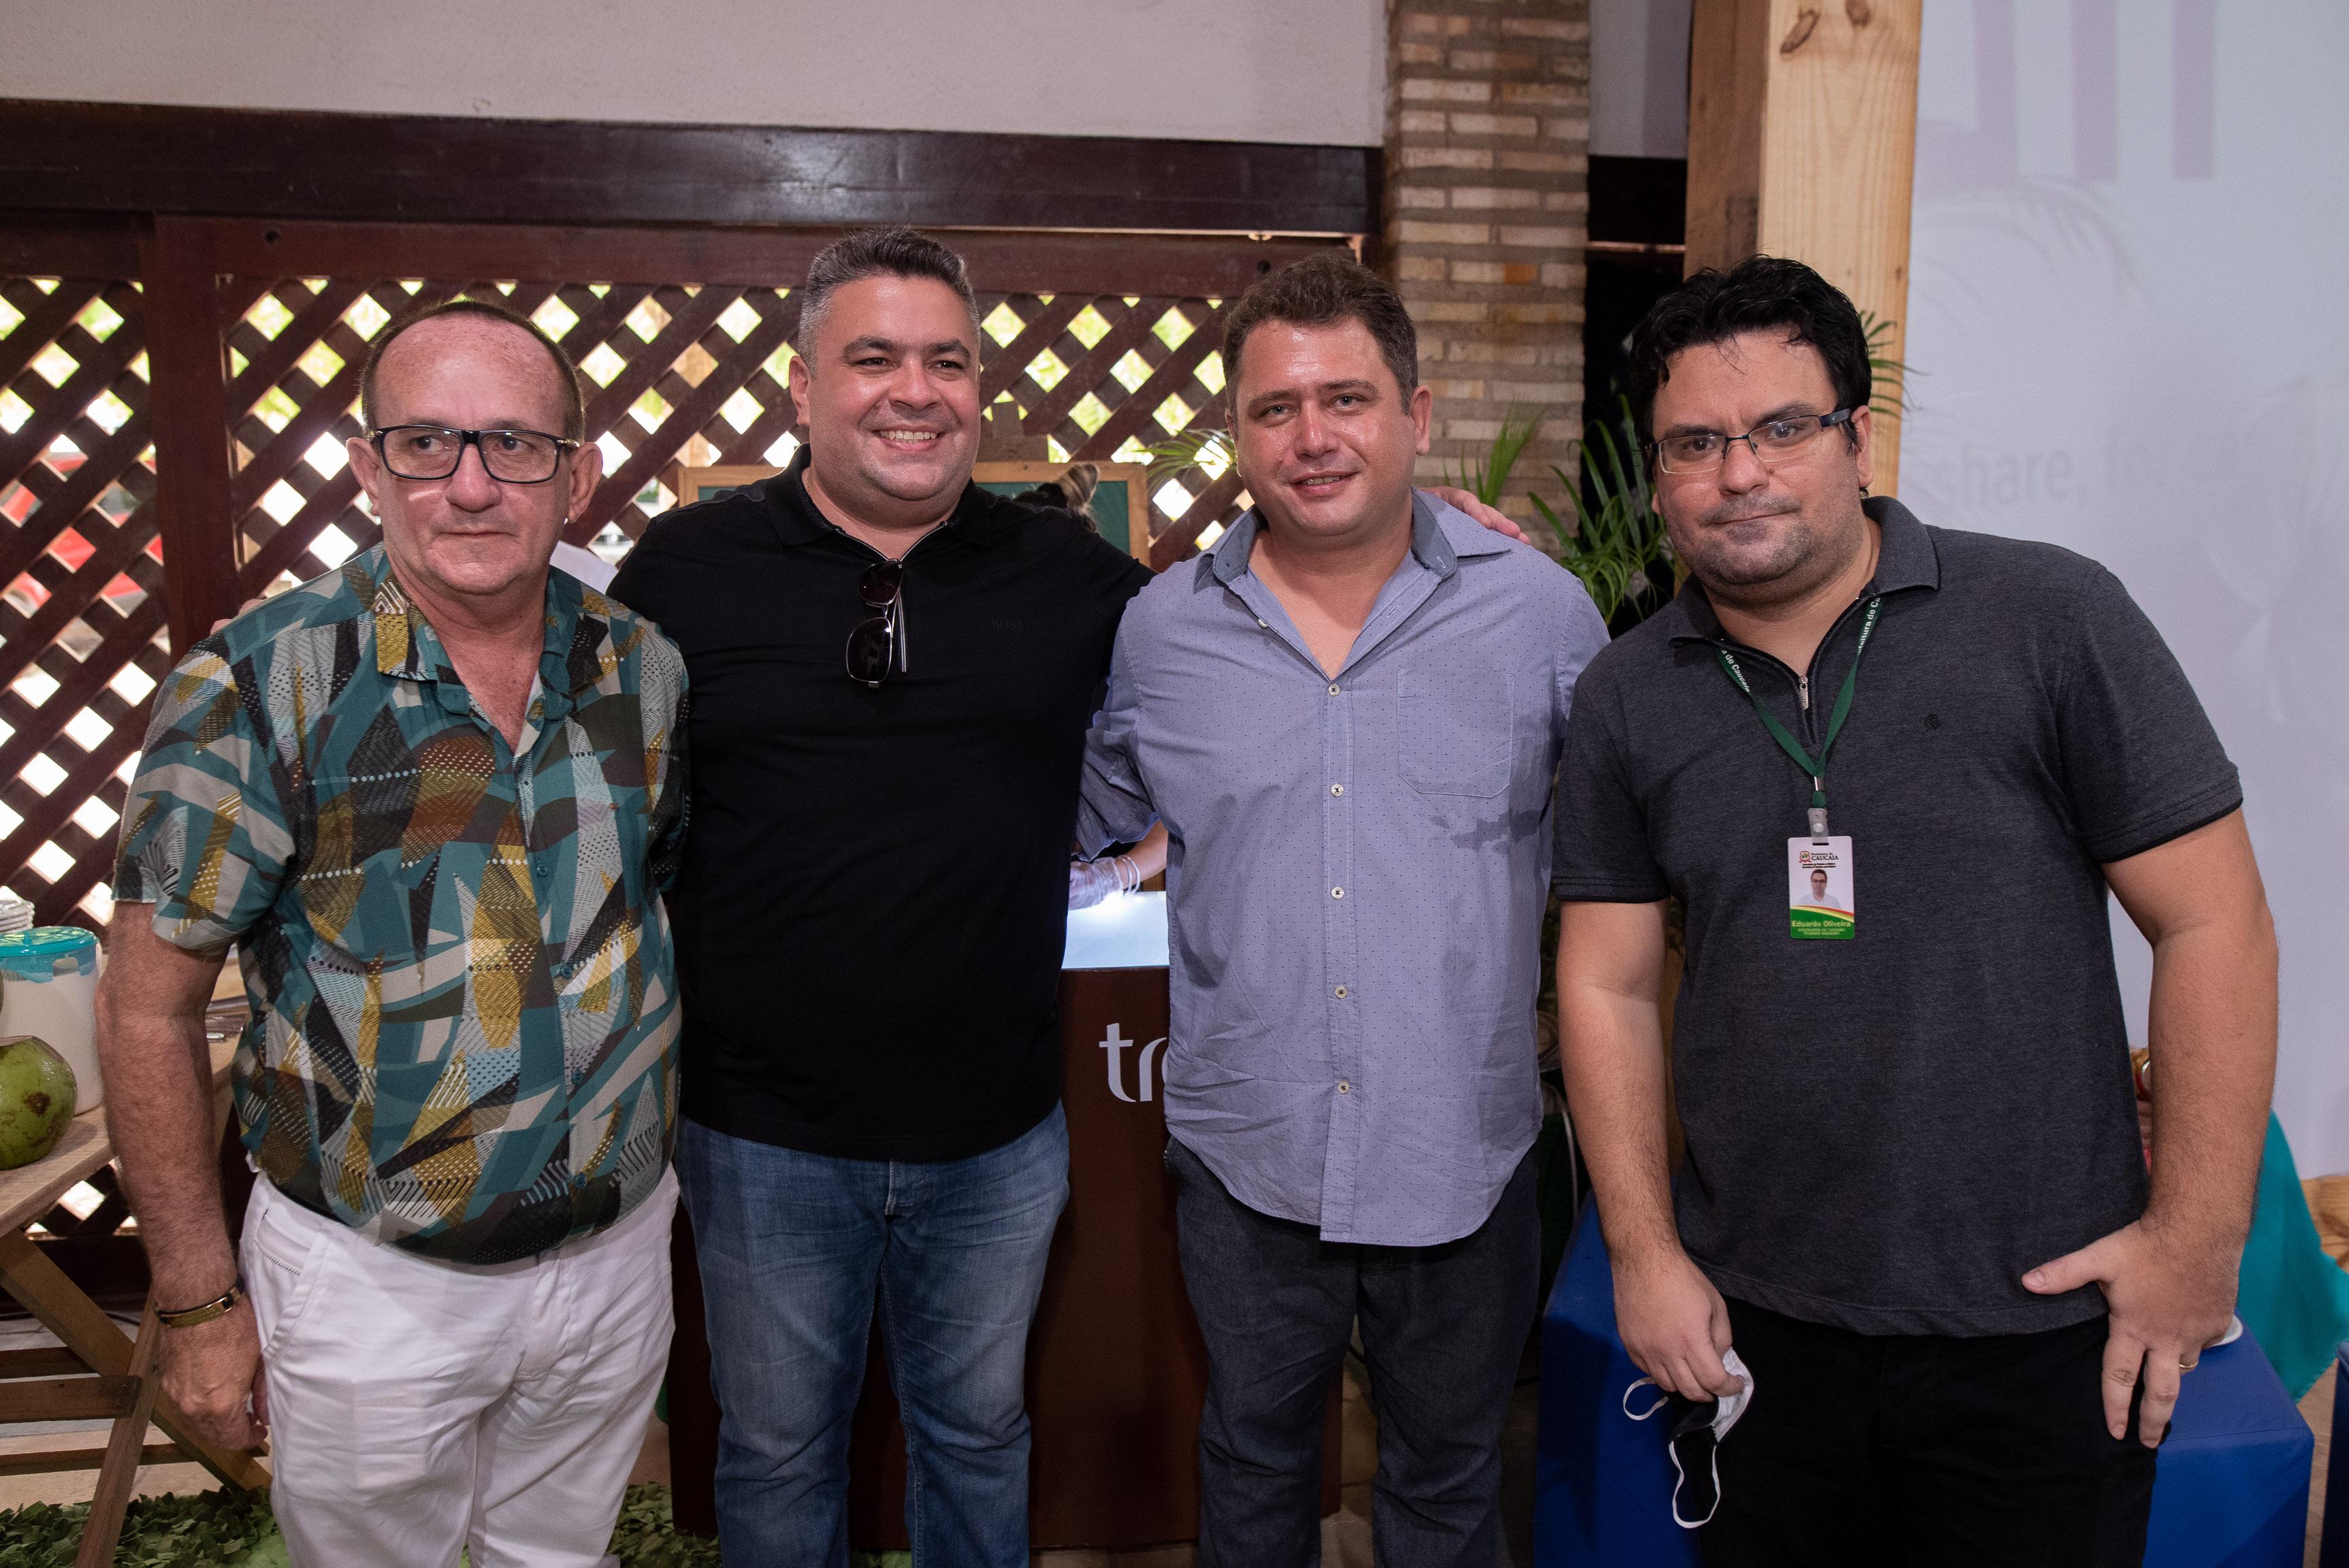 Eugenio Oliveira, Felipe Pontes, Reinaldo Chalemberge E Eduardo Santos